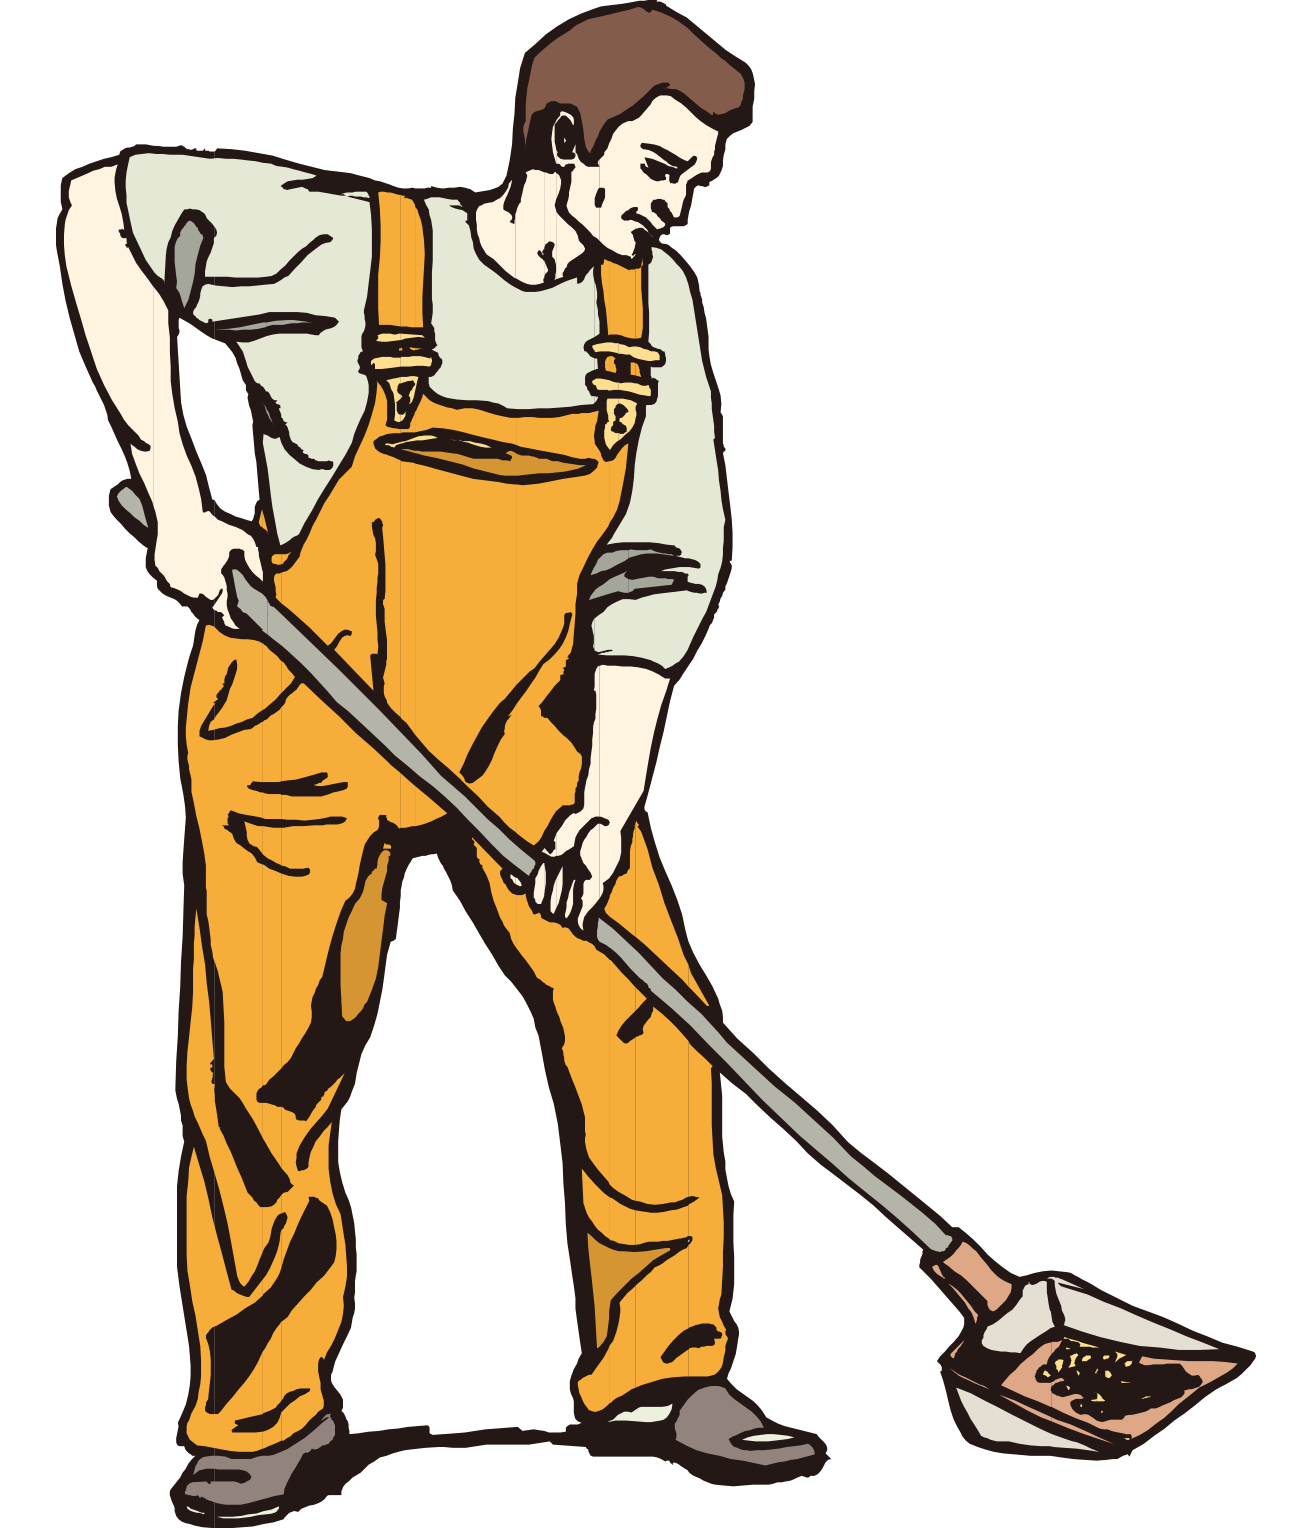 Snow removal clip art. Construction clipart shovel